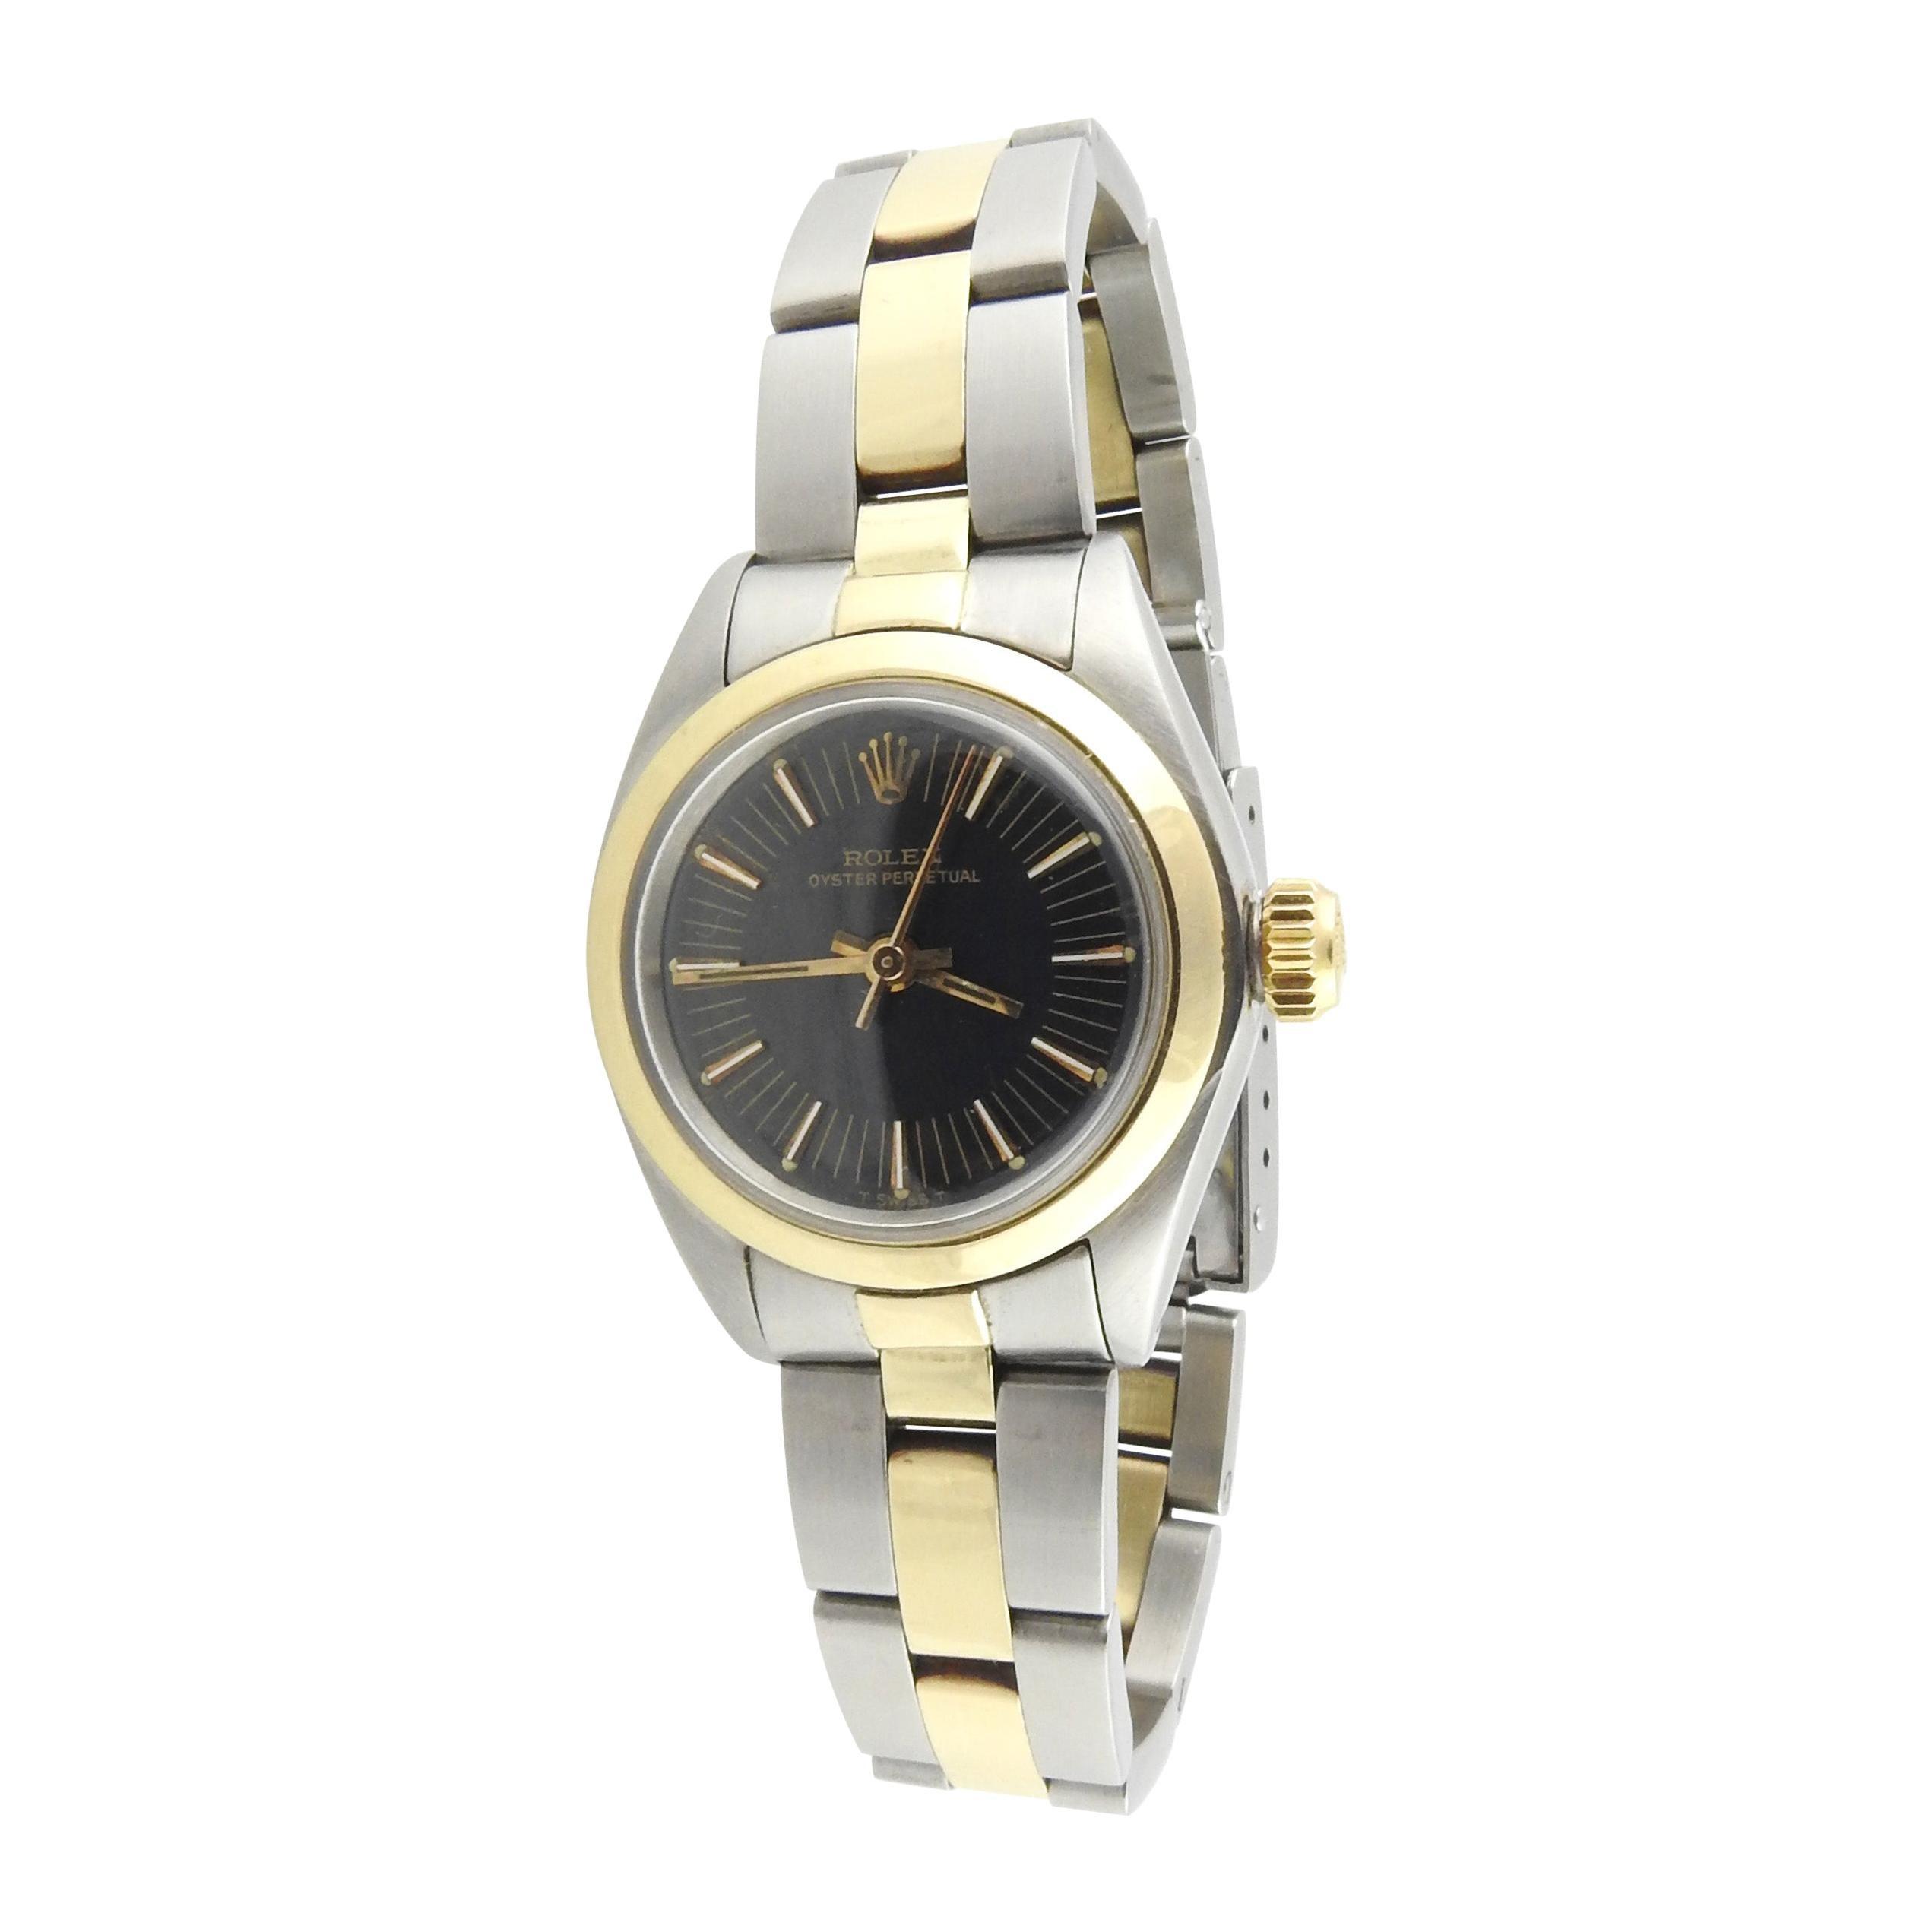 1975 Rolex Ladies 14k Yellow Gold Steel Watch Black Dial 6723